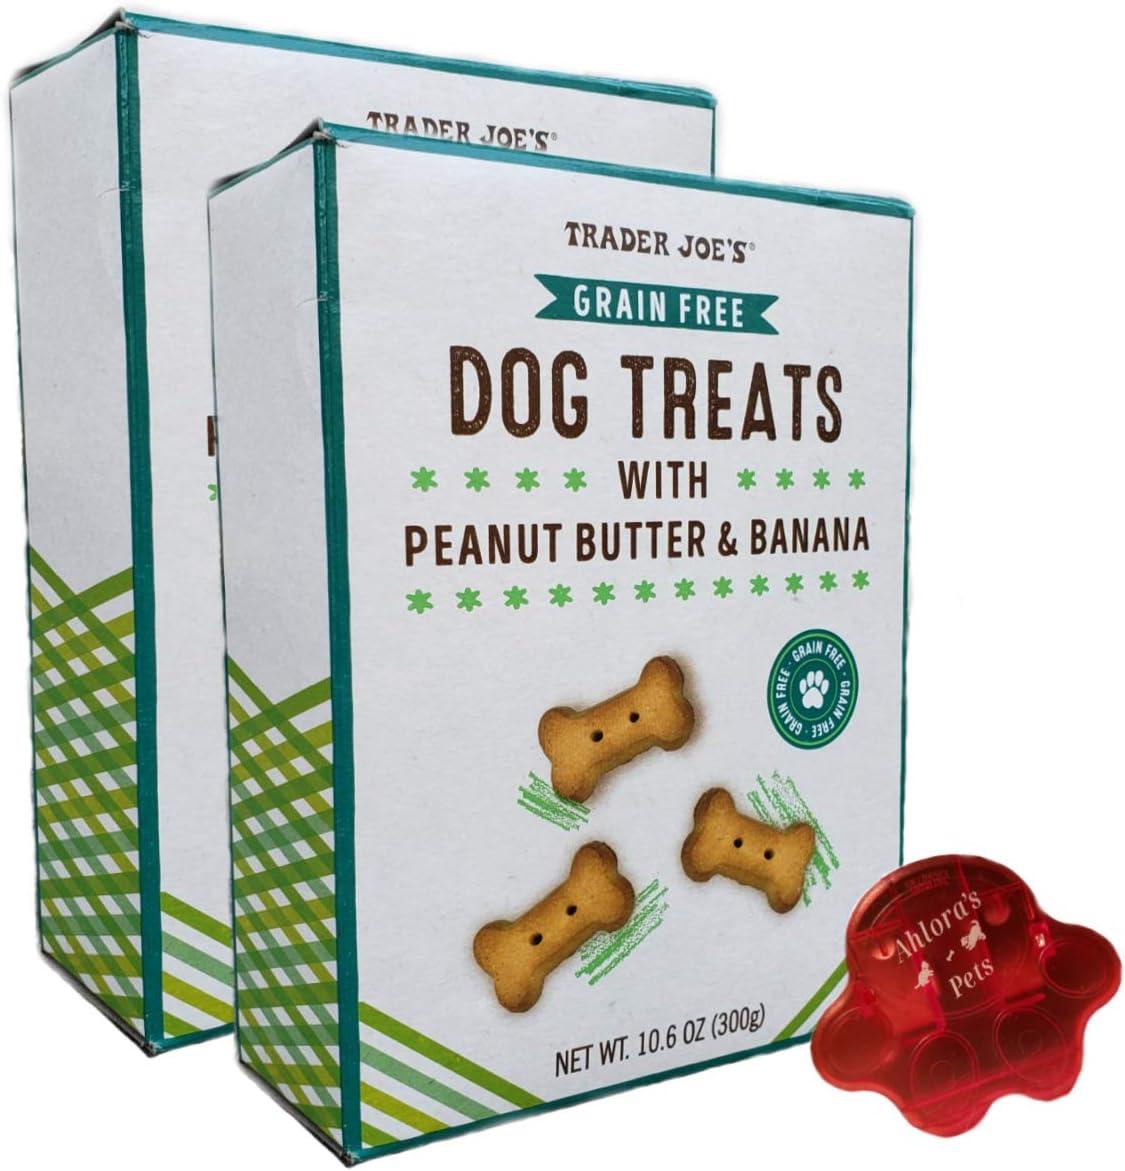 Ahlora's Pets Grain Free Dog Treat Bundle- Dog Treats with Peanut Butter & Banana by Trader Joe's - Bundled with Bag Clip Natural & Healthy Dog Snacks